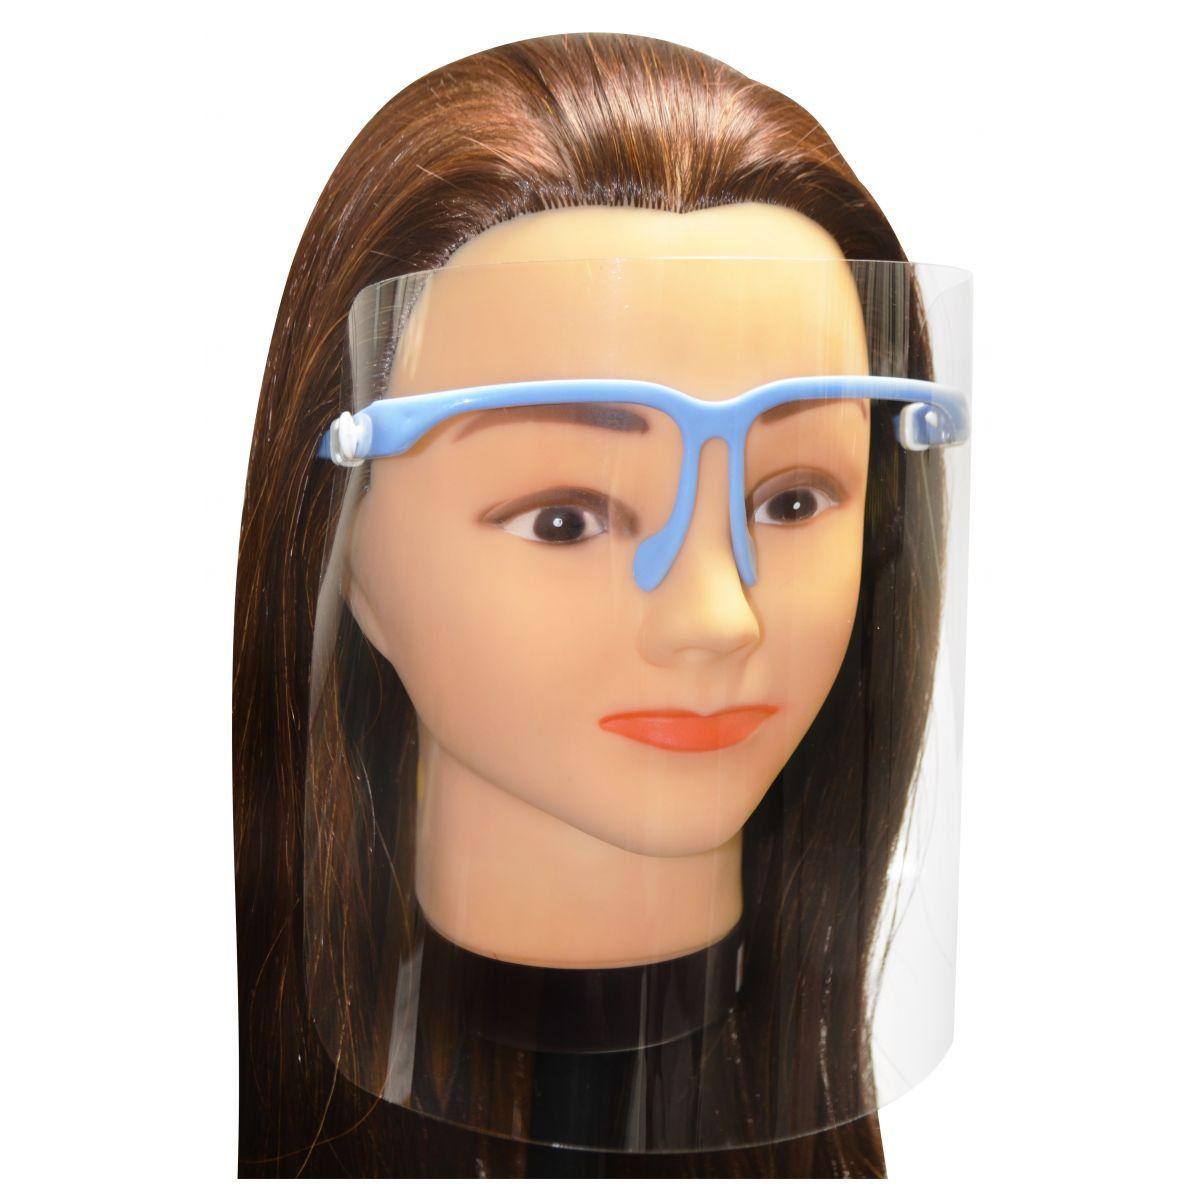 Protetor Facial de Plástico - Santa Clara